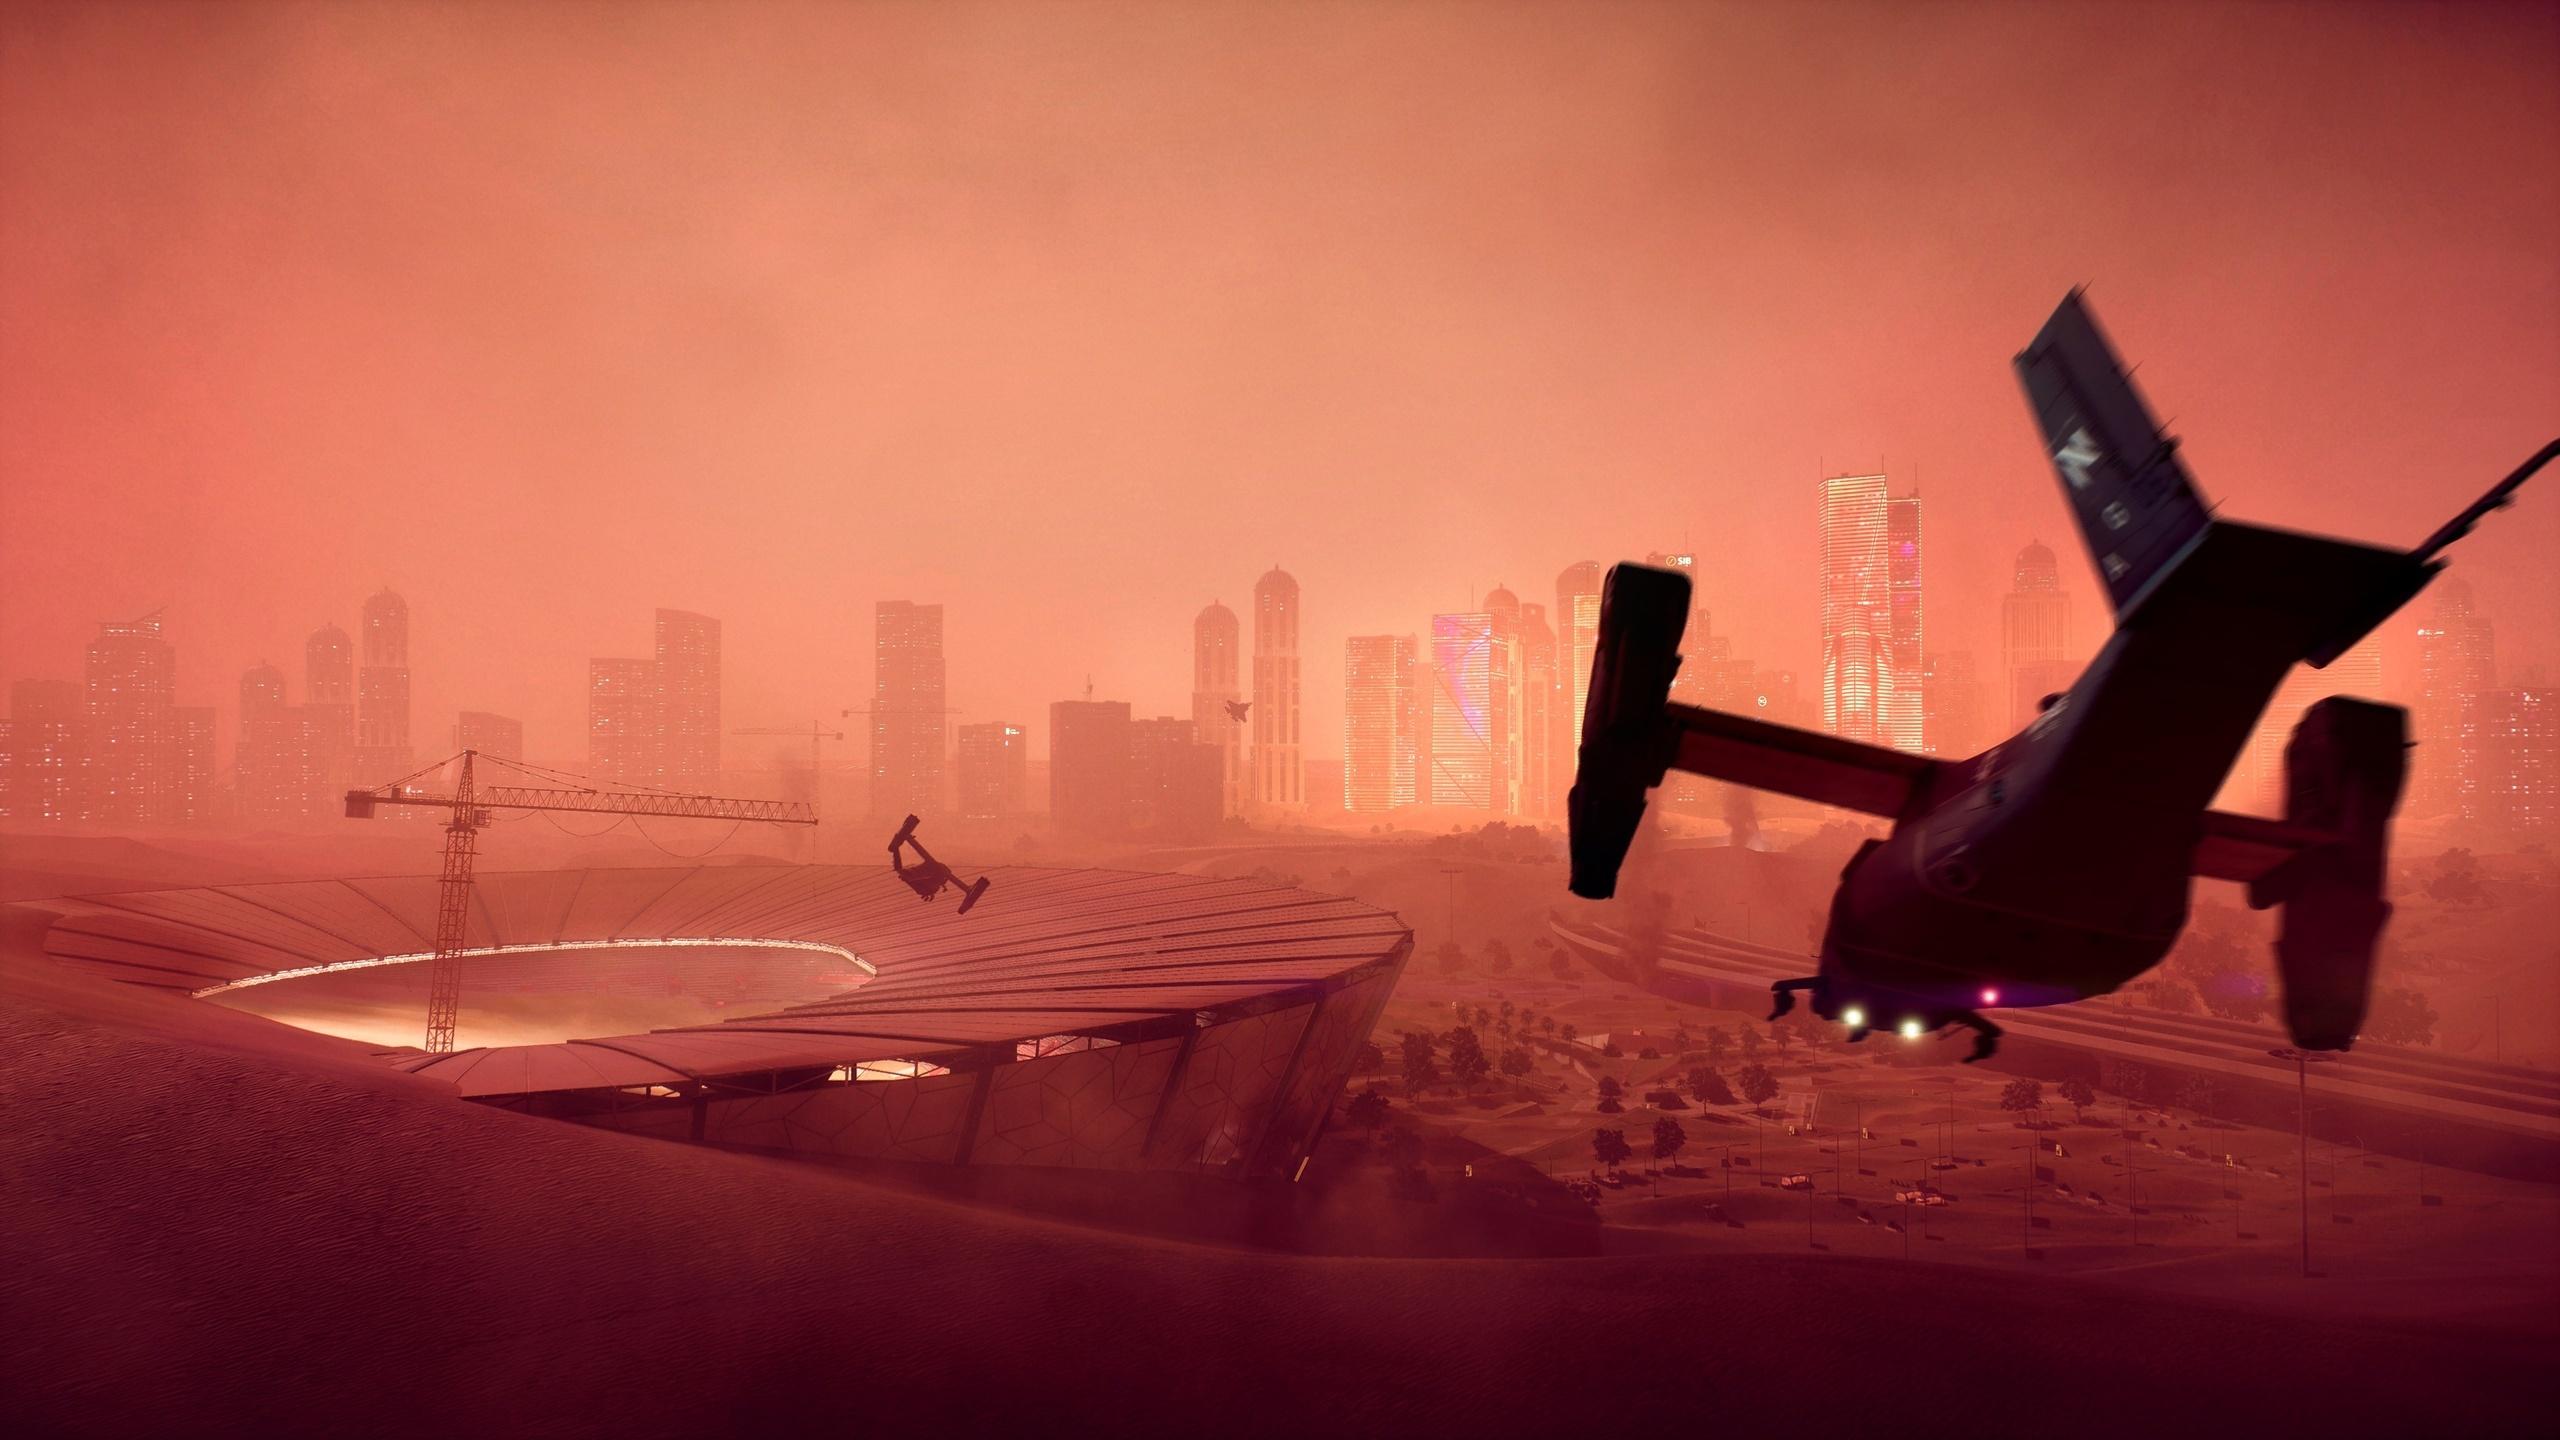 Battlefield 2042 desktop background